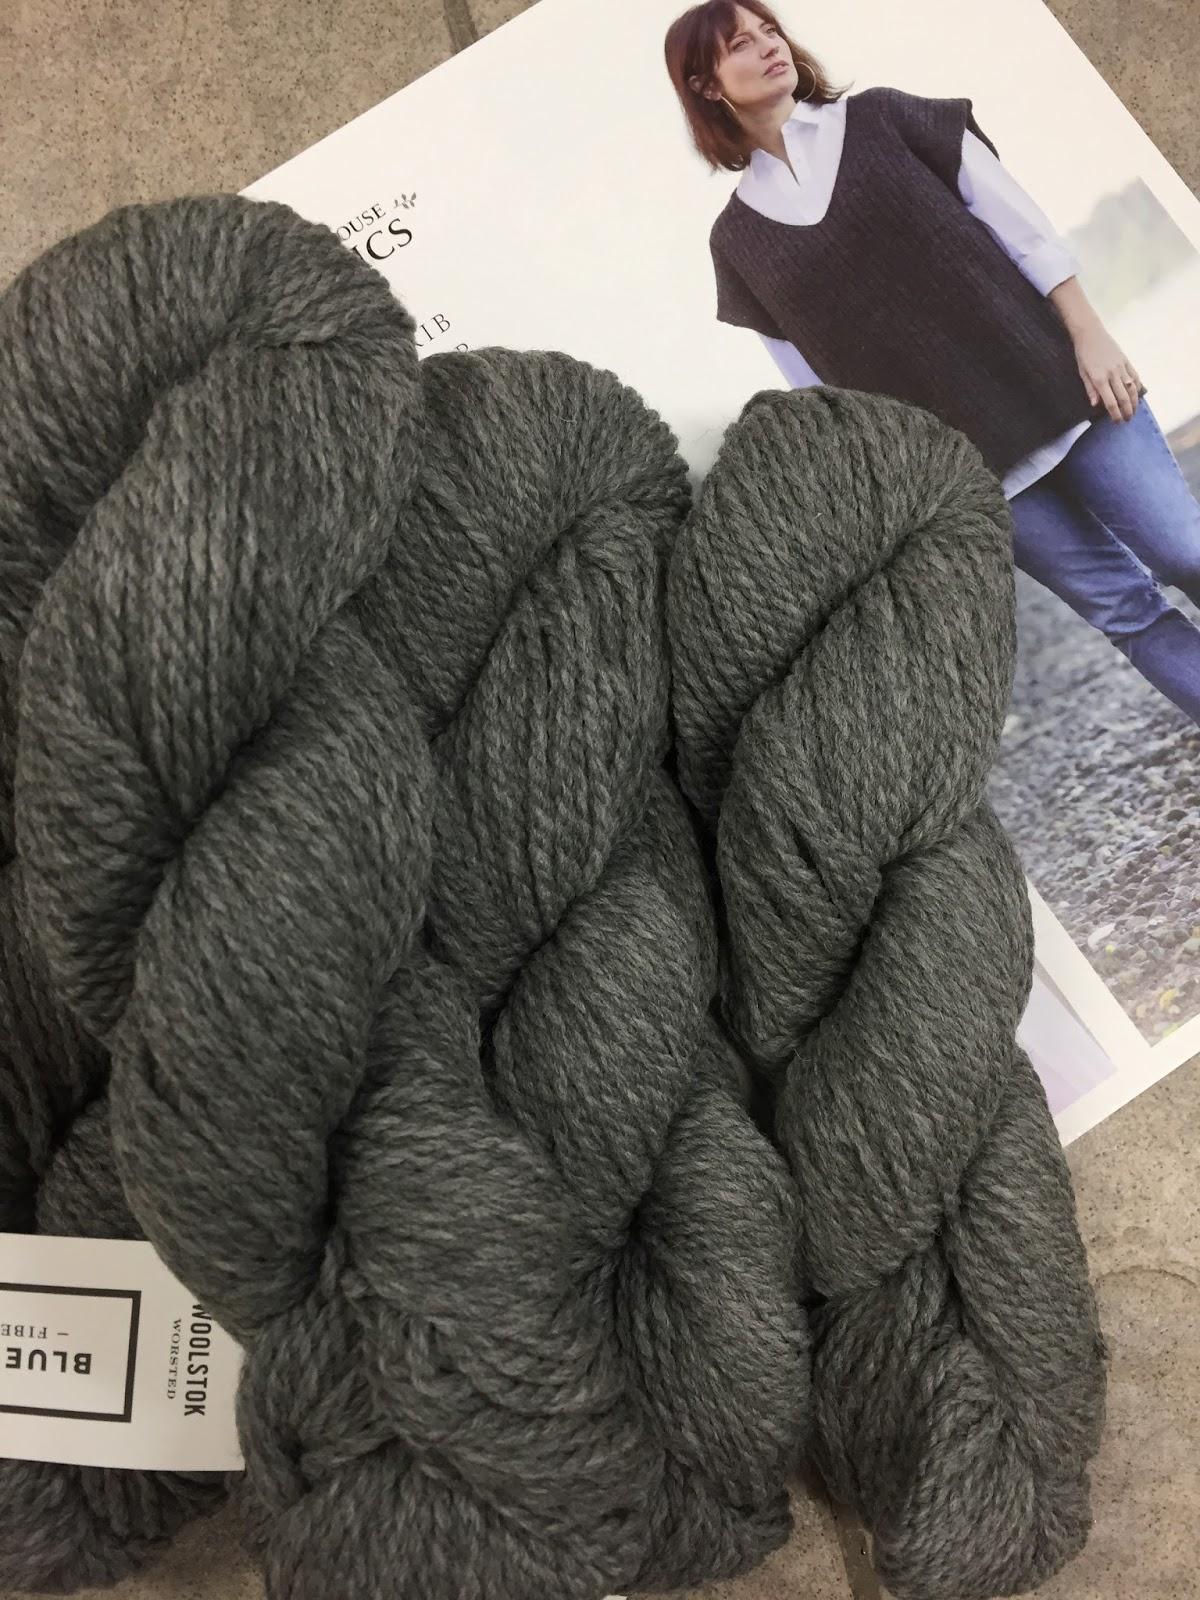 A Really Good Yarn: Popover